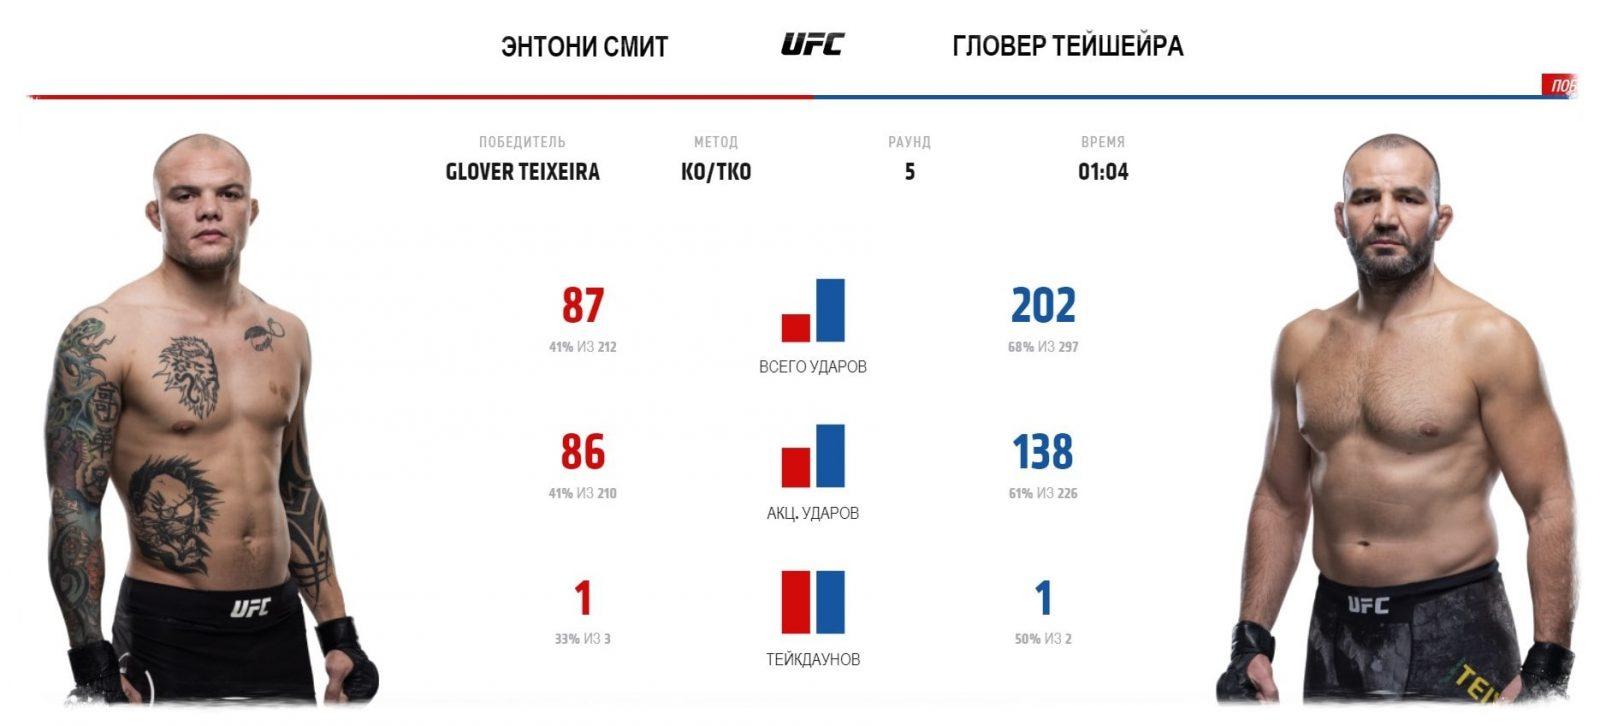 ehntoni-smit-glover-tejshejra-video-boya-ufc-fight-night-smith-vs-teixeira